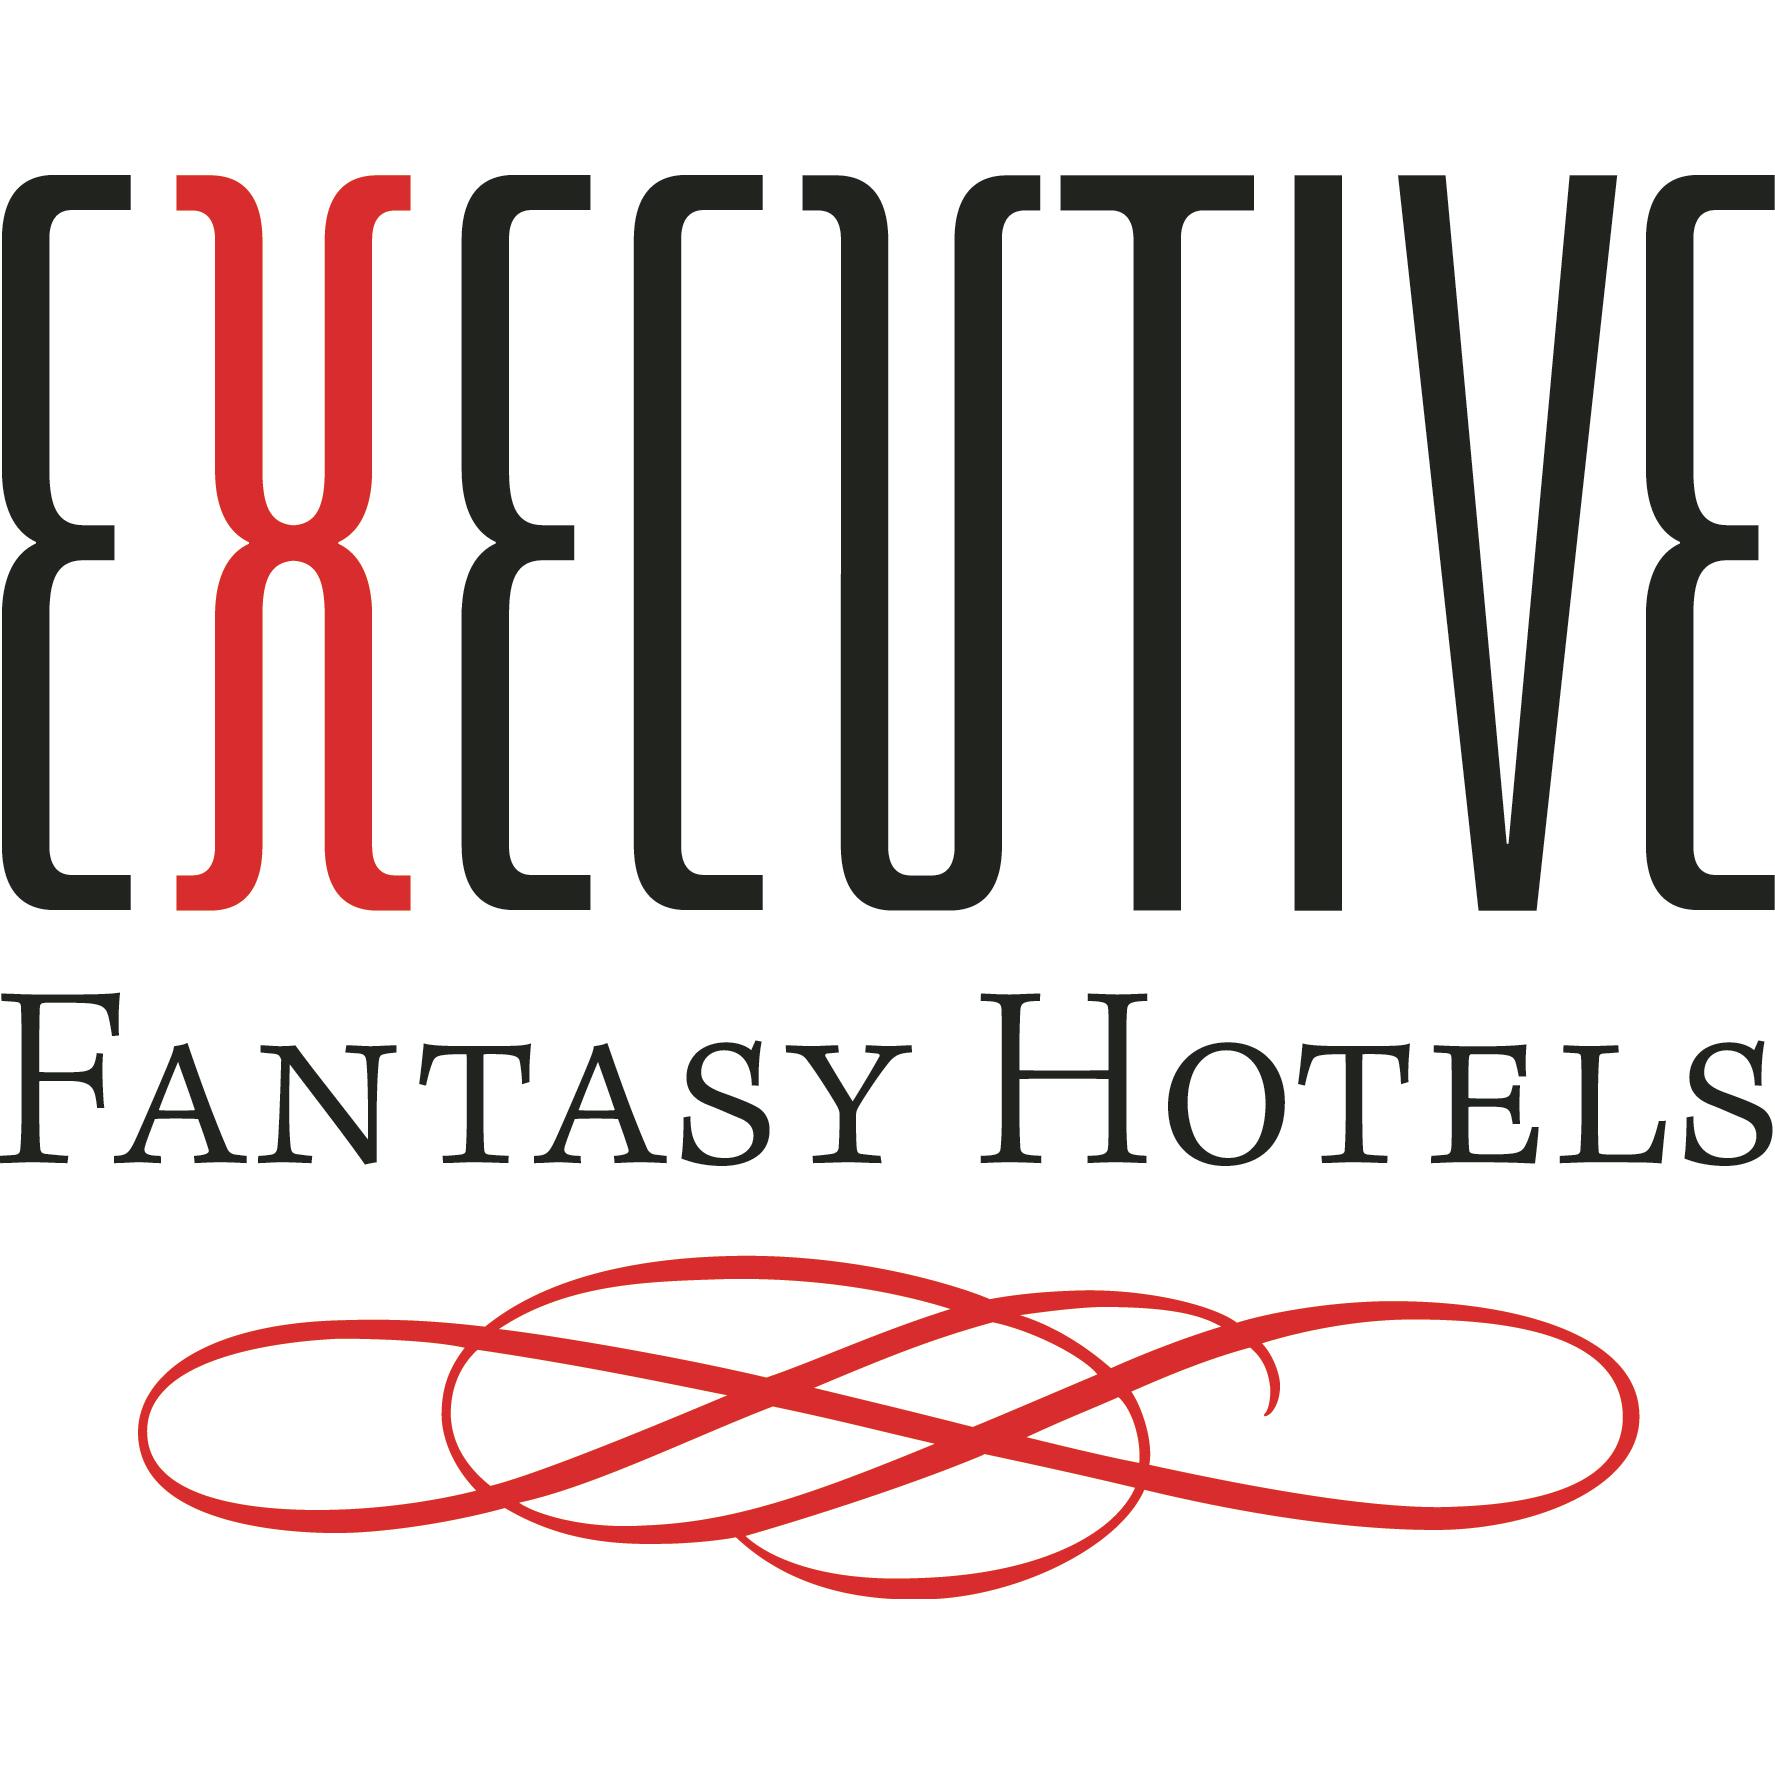 Executive Airport Hotel